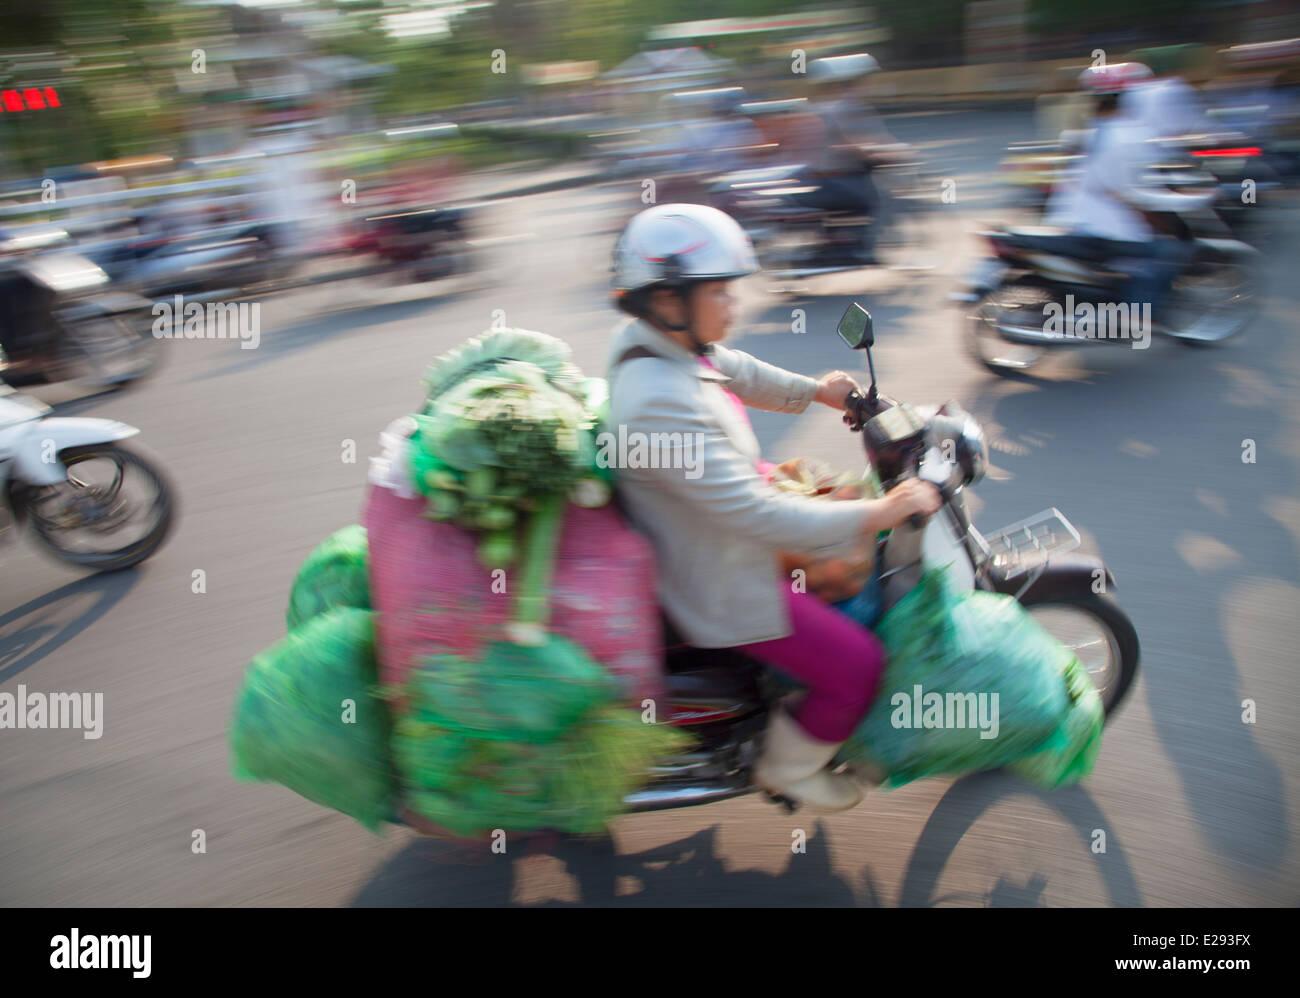 People riding motorbikes, Hue, Thua Thien-Hue, Vietnam - Stock Image